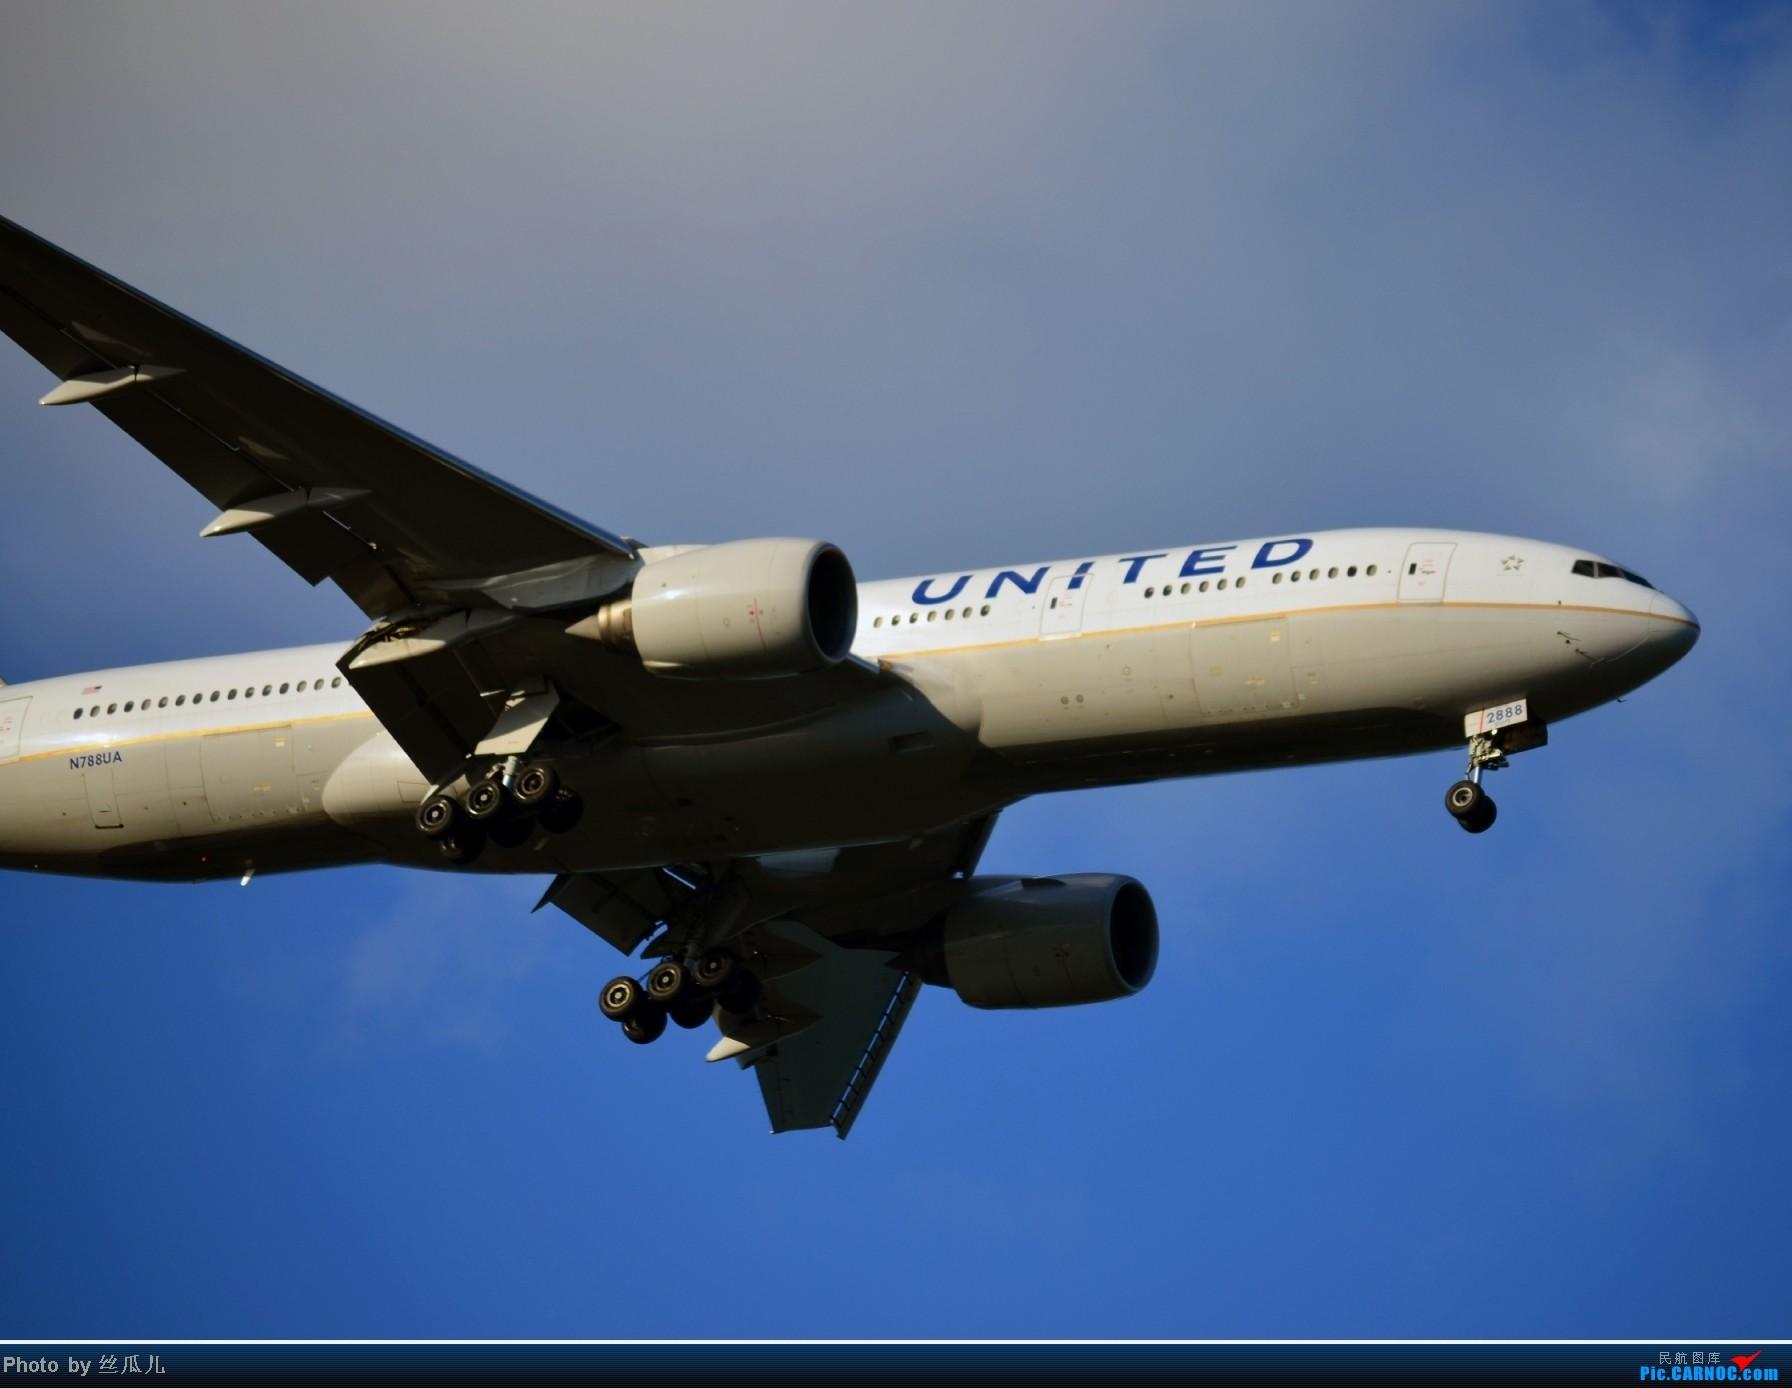 Re:[原创]浦东机场手痒痒了 BOEING 777-200 N788UA 中国上海浦东机场